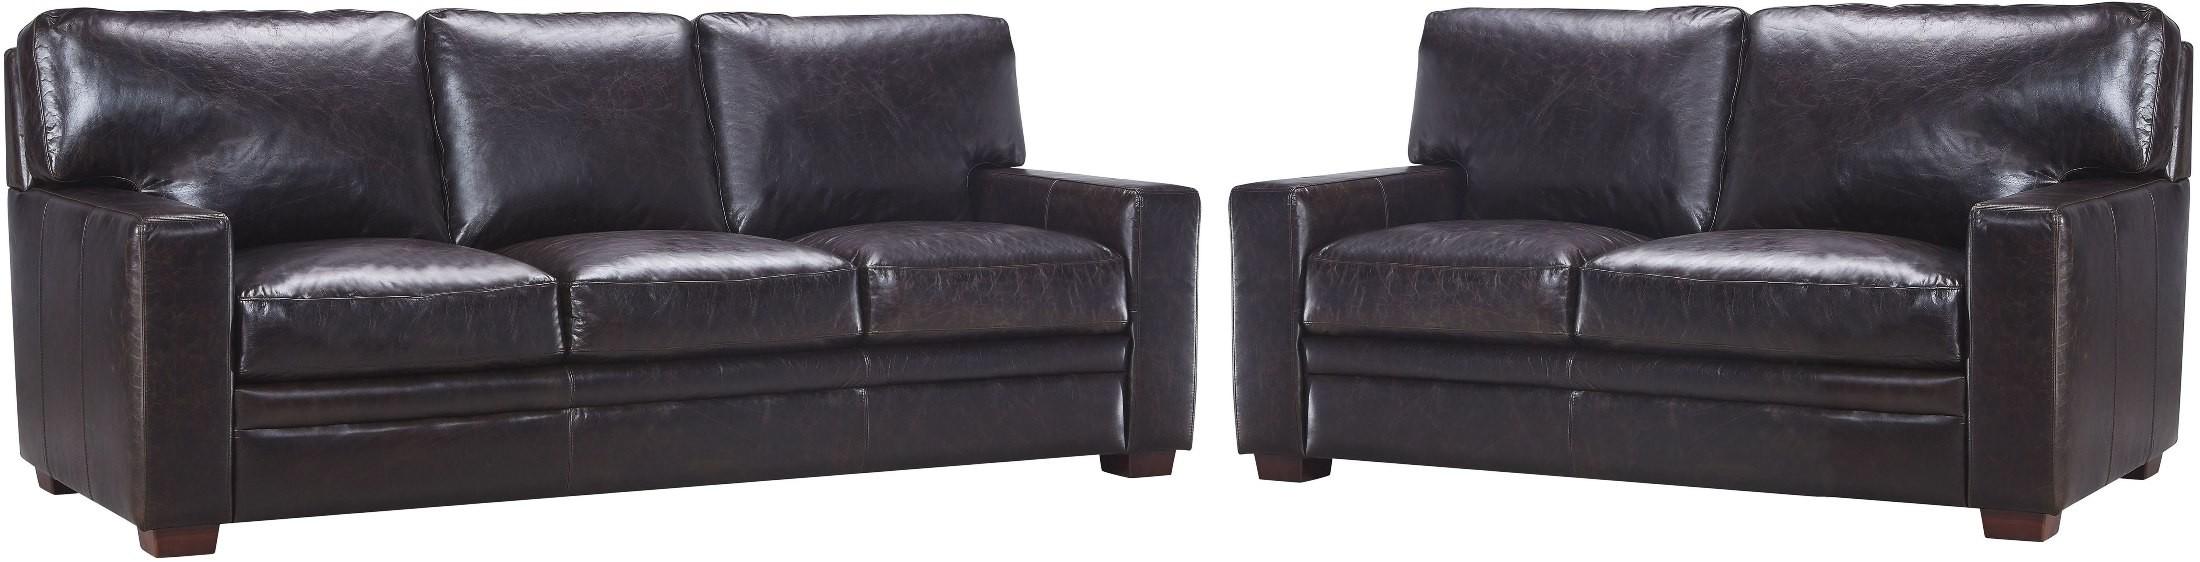 leather italia sofa furniture catnapper bonded georgetowne norman dark brown living room set from